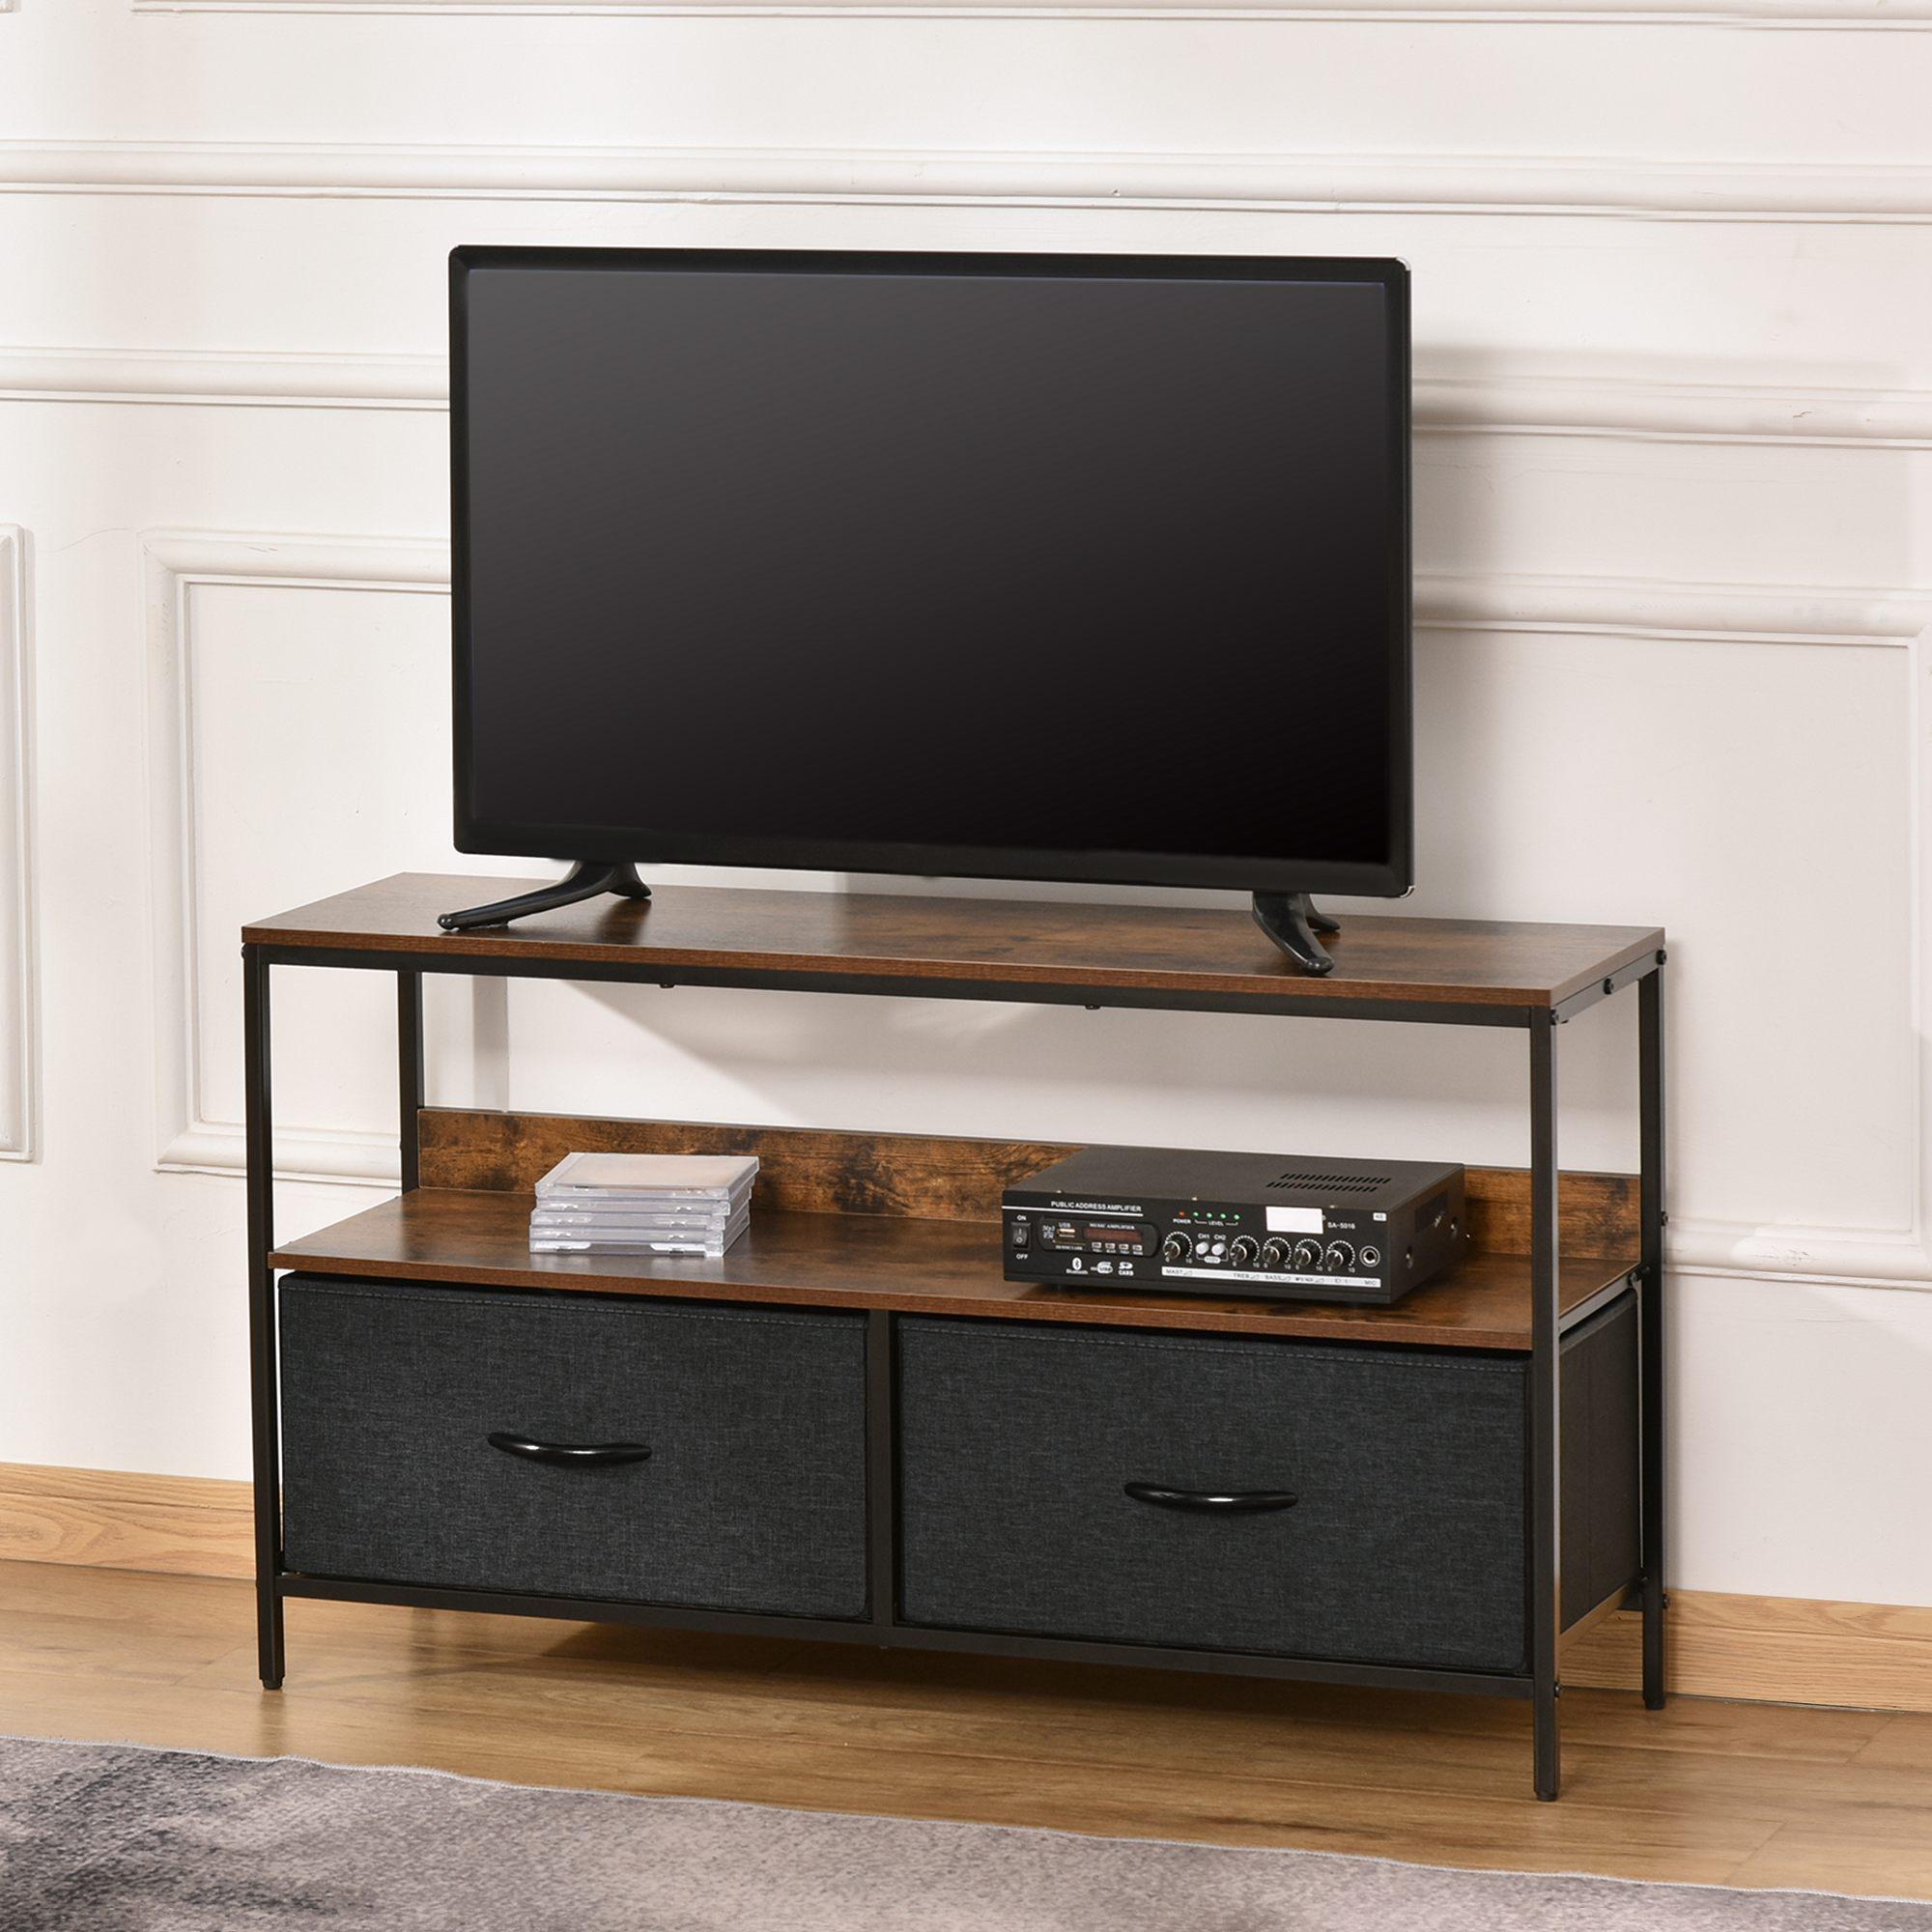 Meuble TV style industriel 2 tiroirs tissu gris métal noir aspect bois